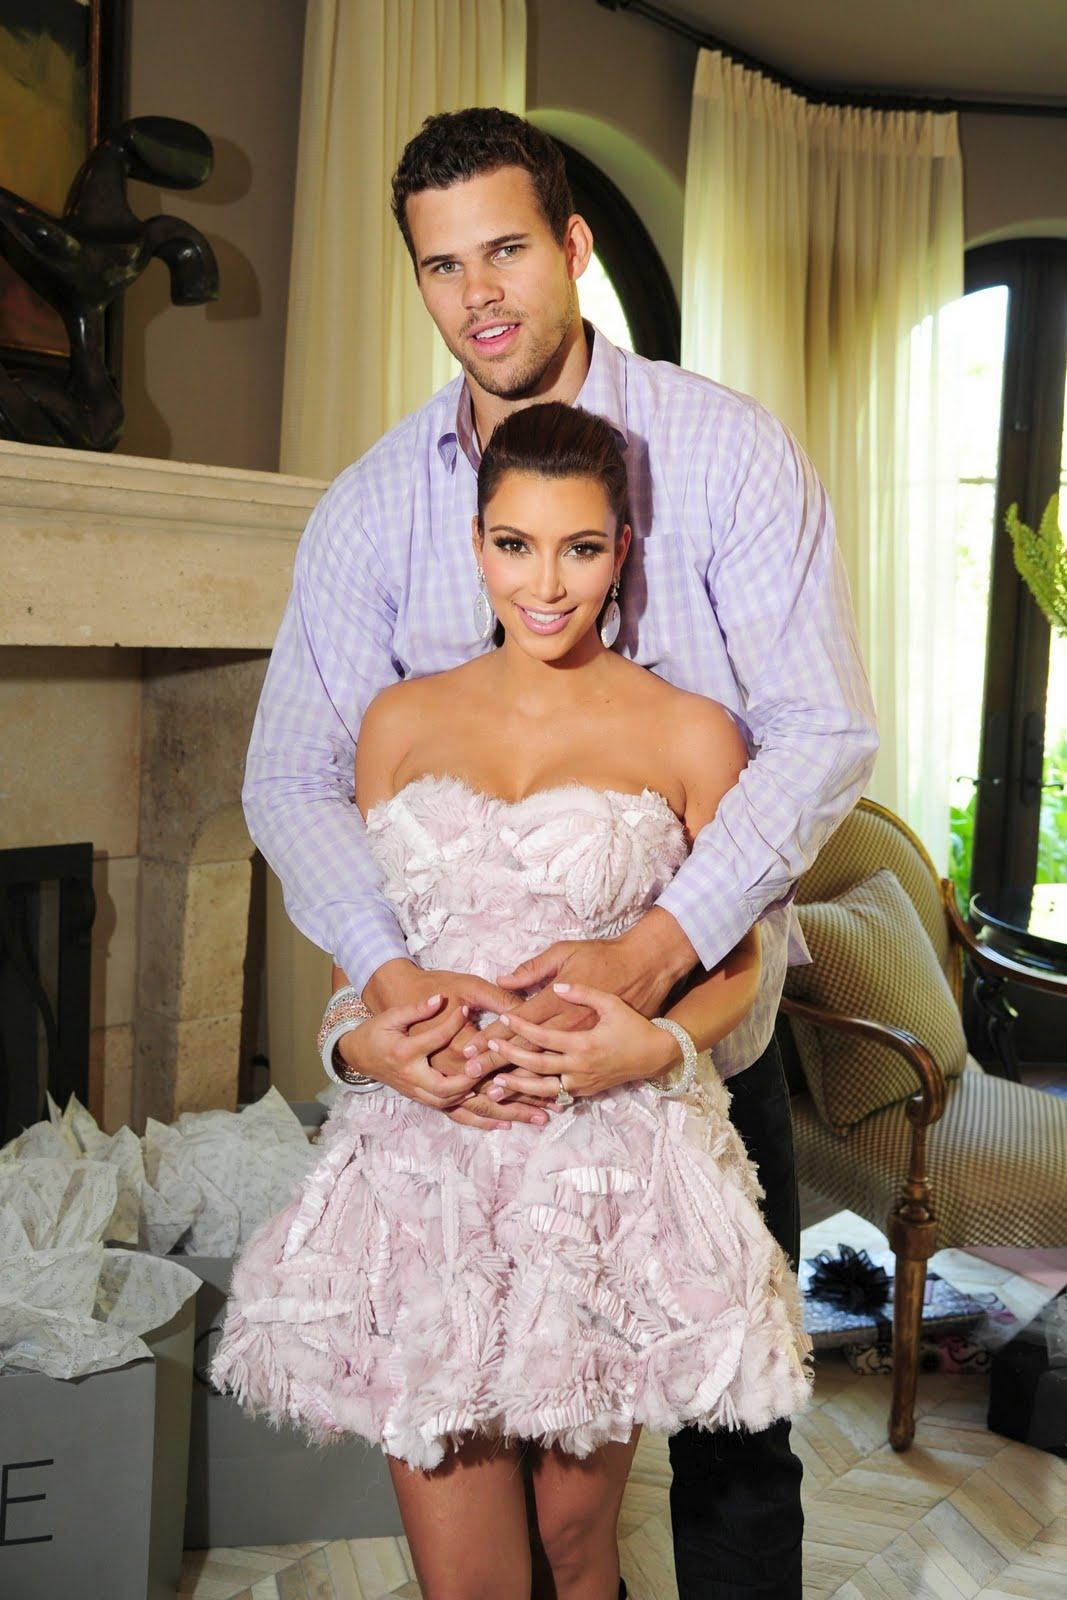 http://3.bp.blogspot.com/-ISJIyAlr6PY/TmX38BKXQhI/AAAAAAAAANU/4ezkT-7m0P4/s1600/Kim-Kardashian-36.jpg